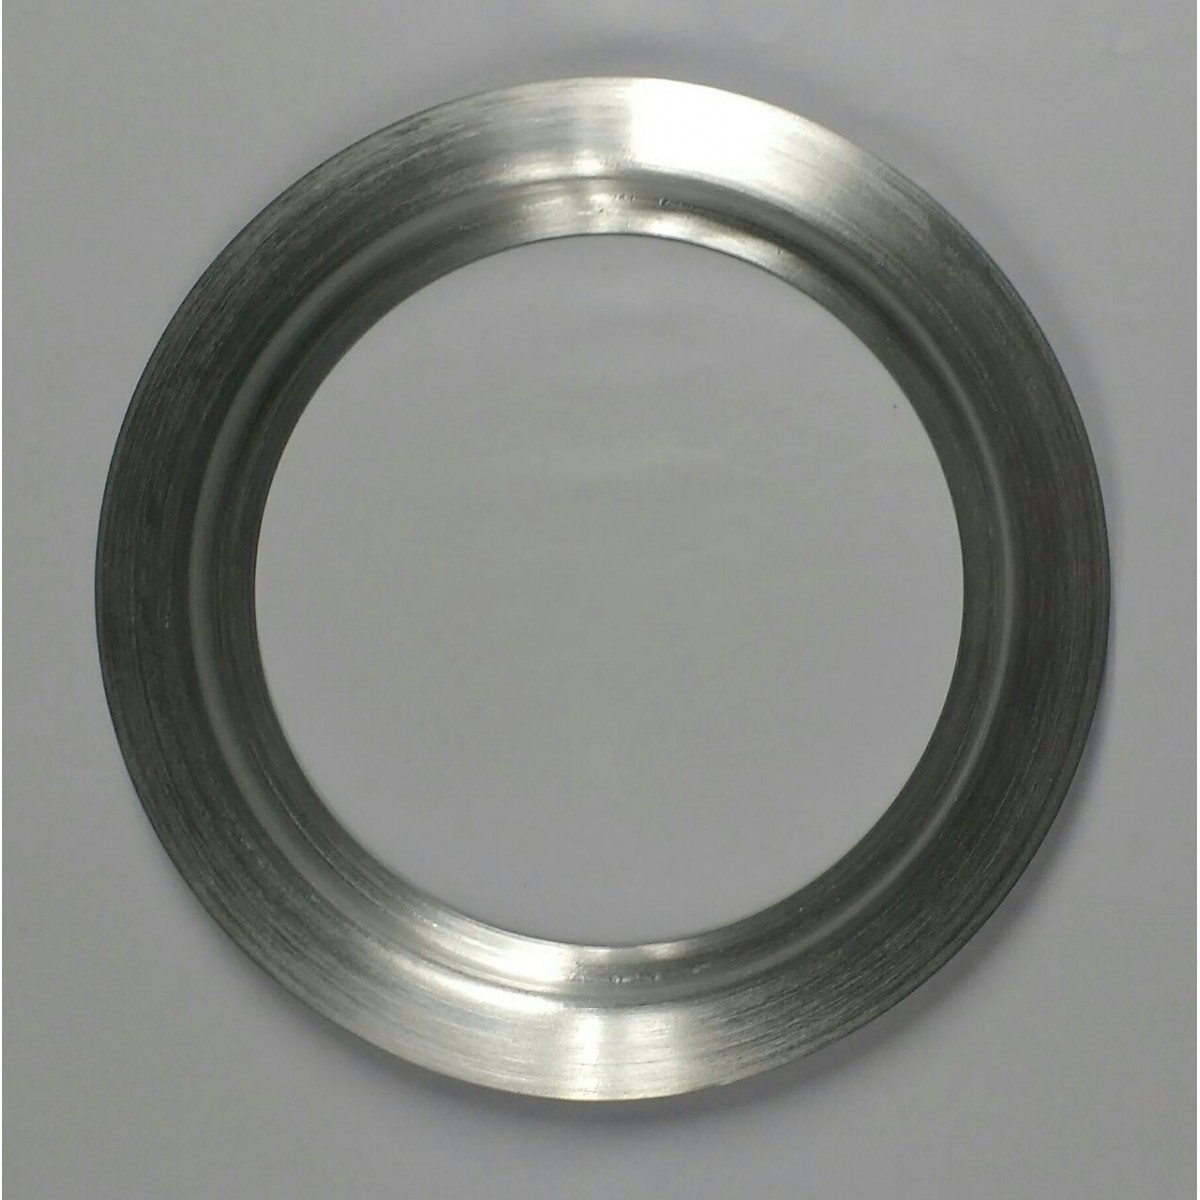 Ma-02/kit 18,5/22 cm escotilha escovada+vidro+silicone